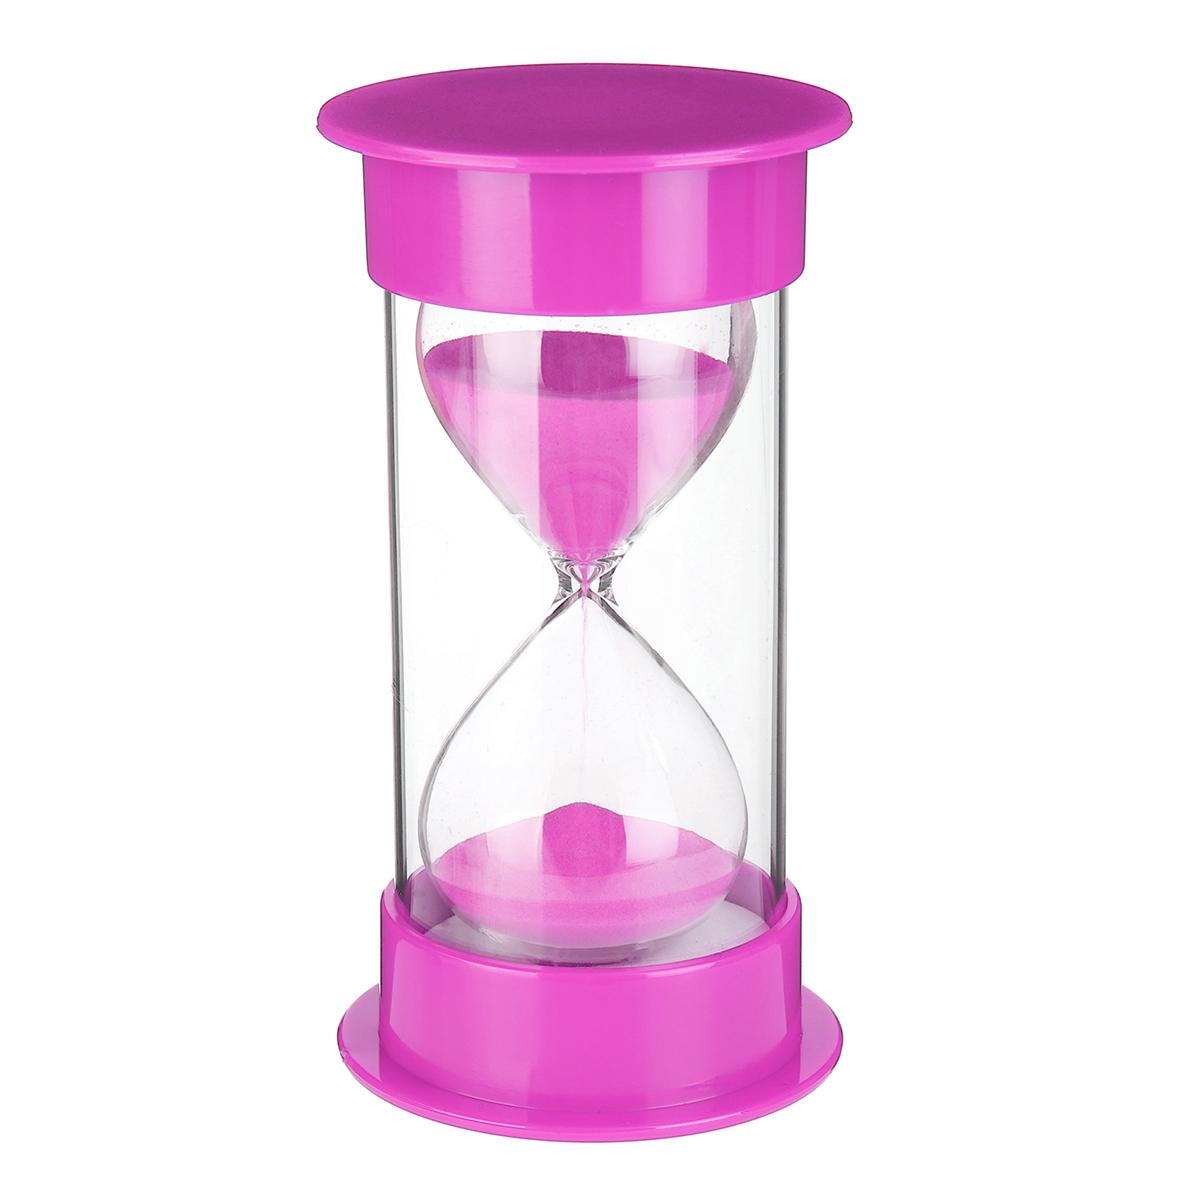 30min Minutes Sand Glass Sandglass Hourglass Timer Clock